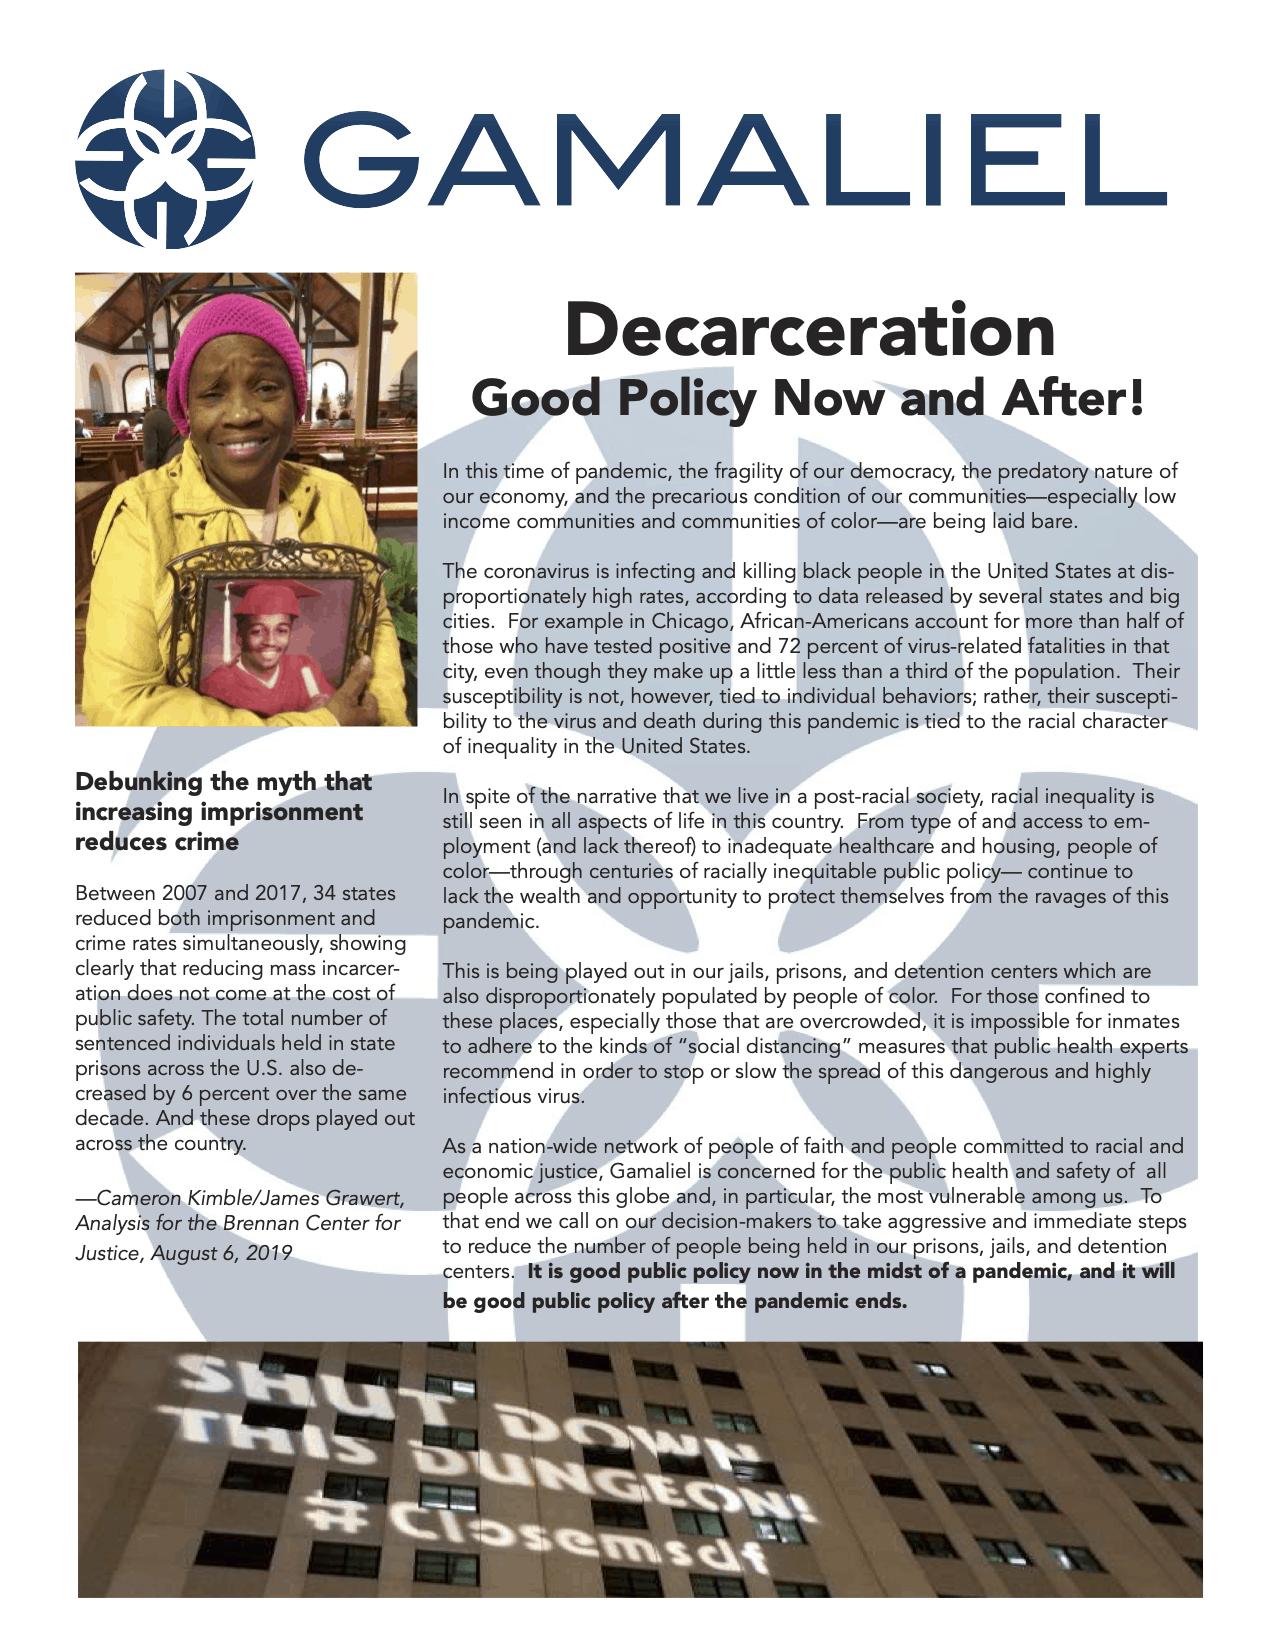 Decarceration - Good Public Policy